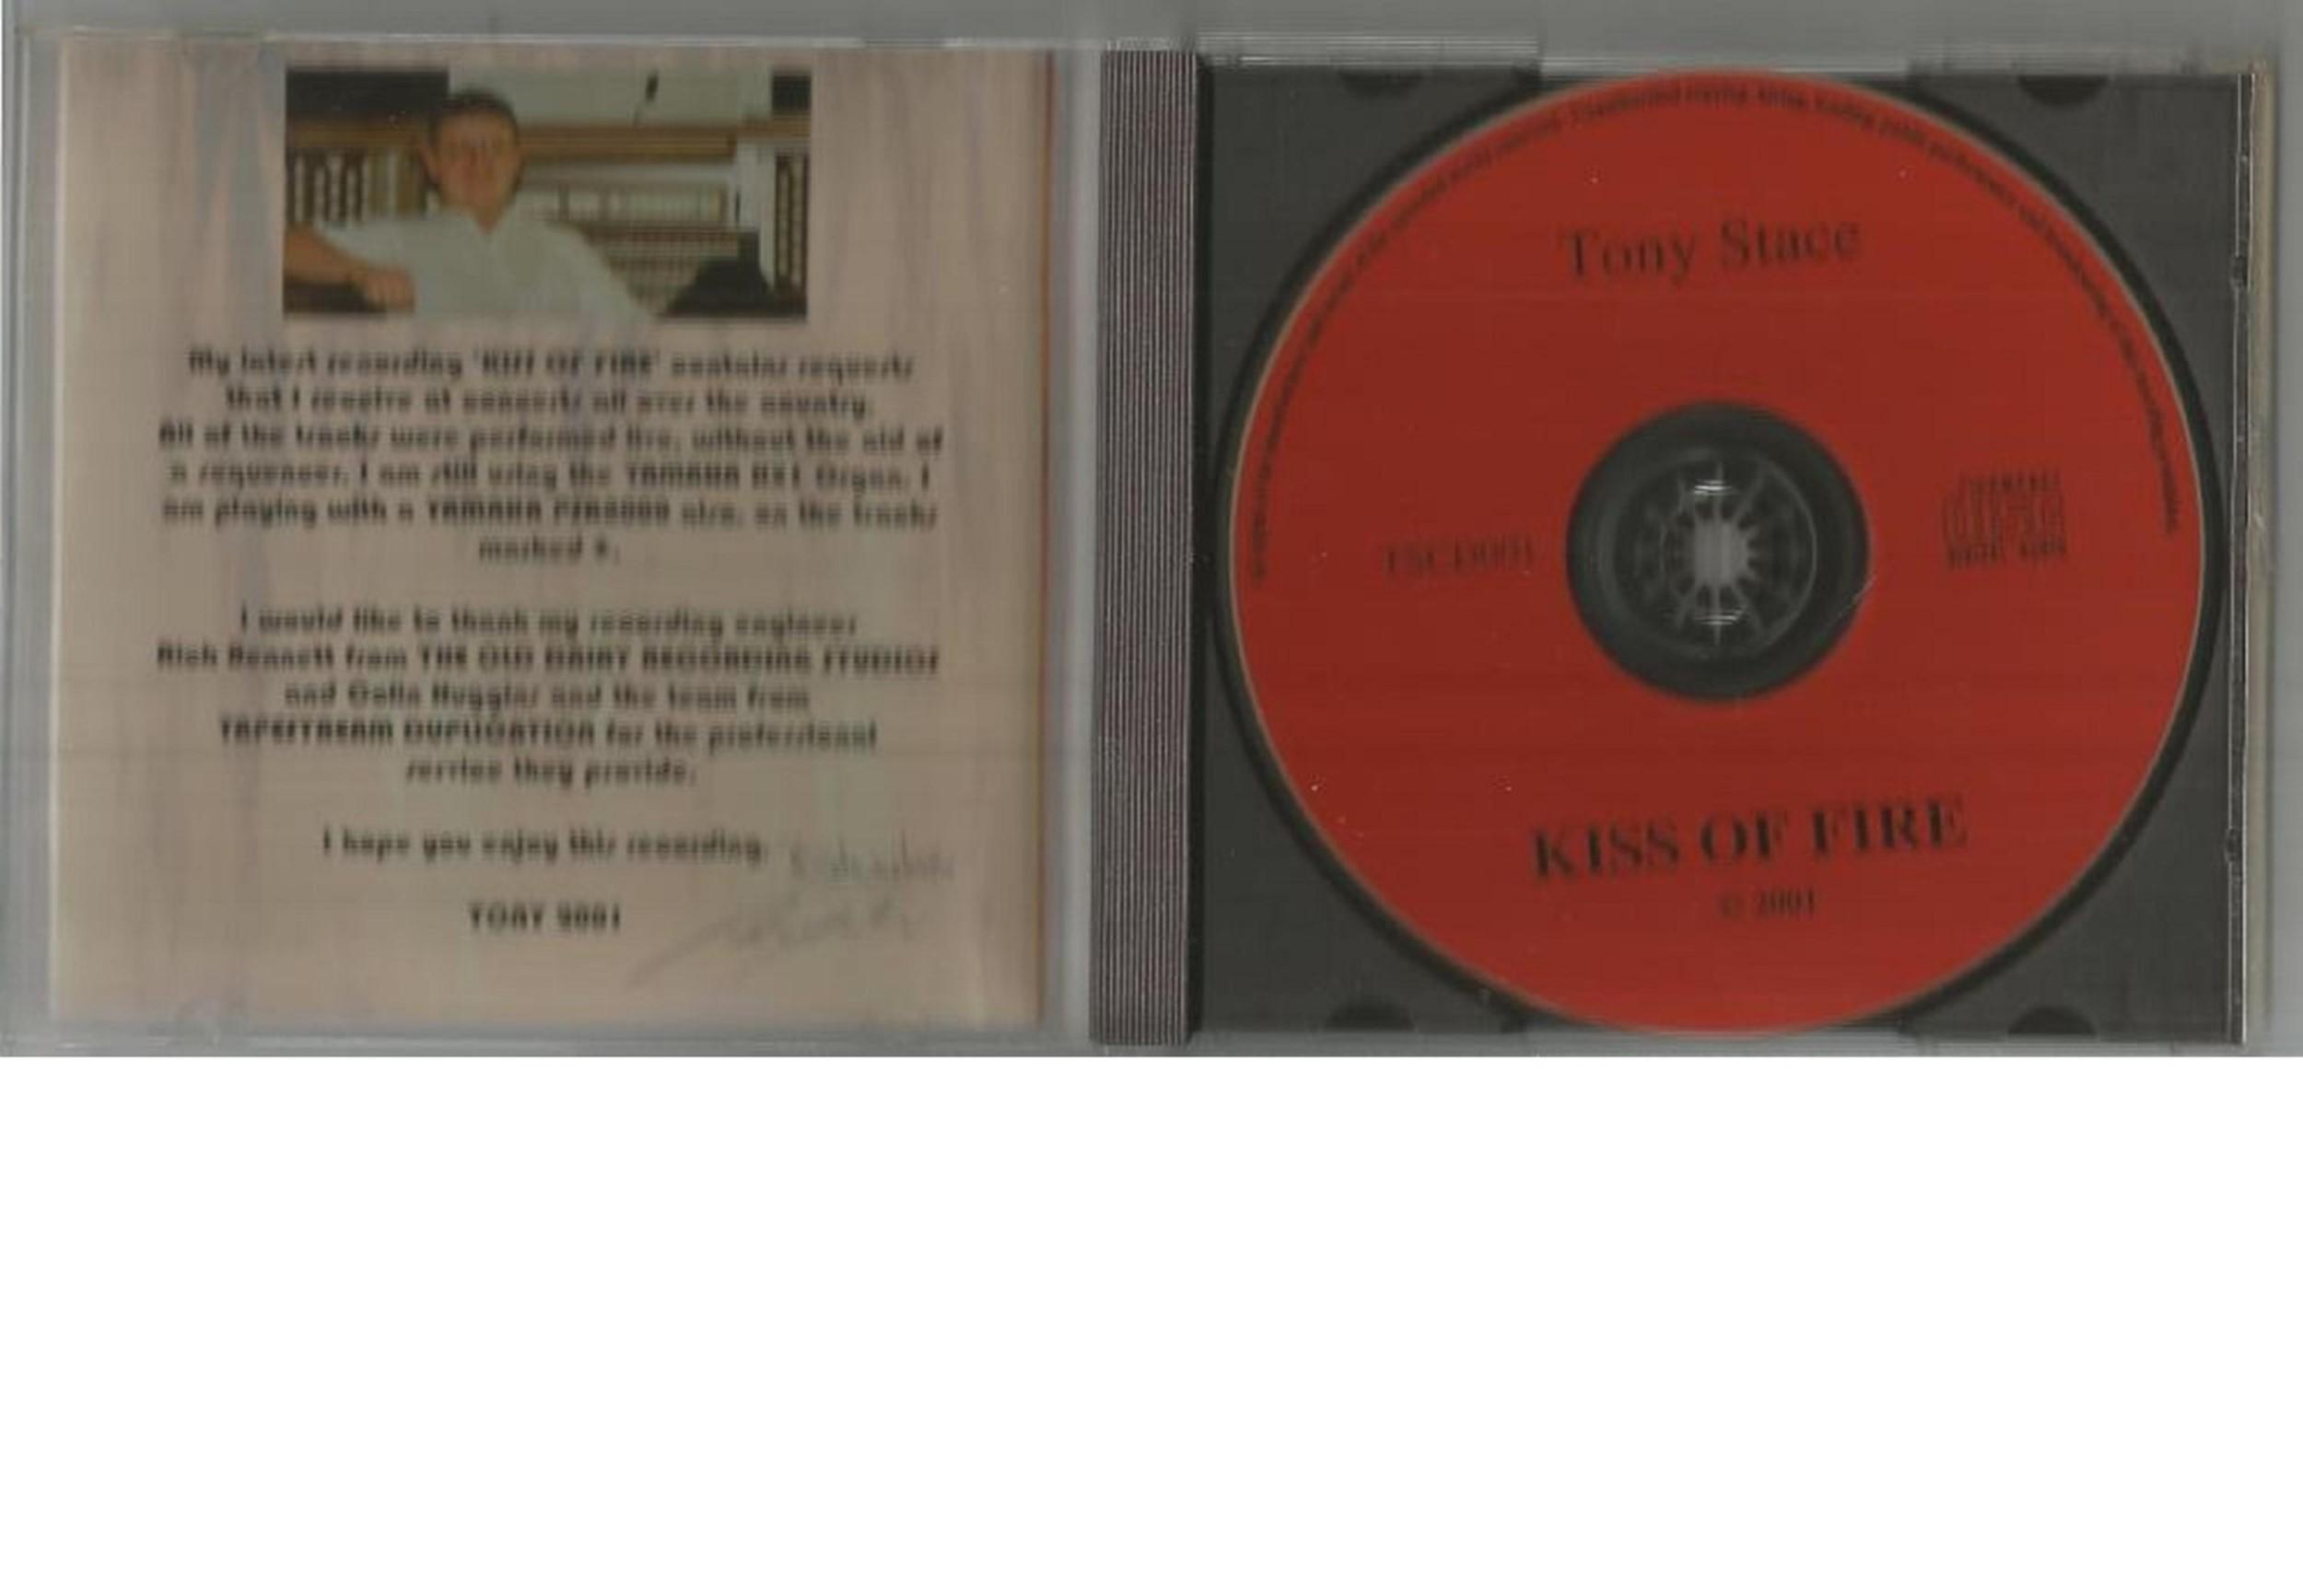 6 Signed CDs Including Joseph L Garlington Joy Disc Included, Compilation Golden Italian Hits Disc - Image 3 of 5